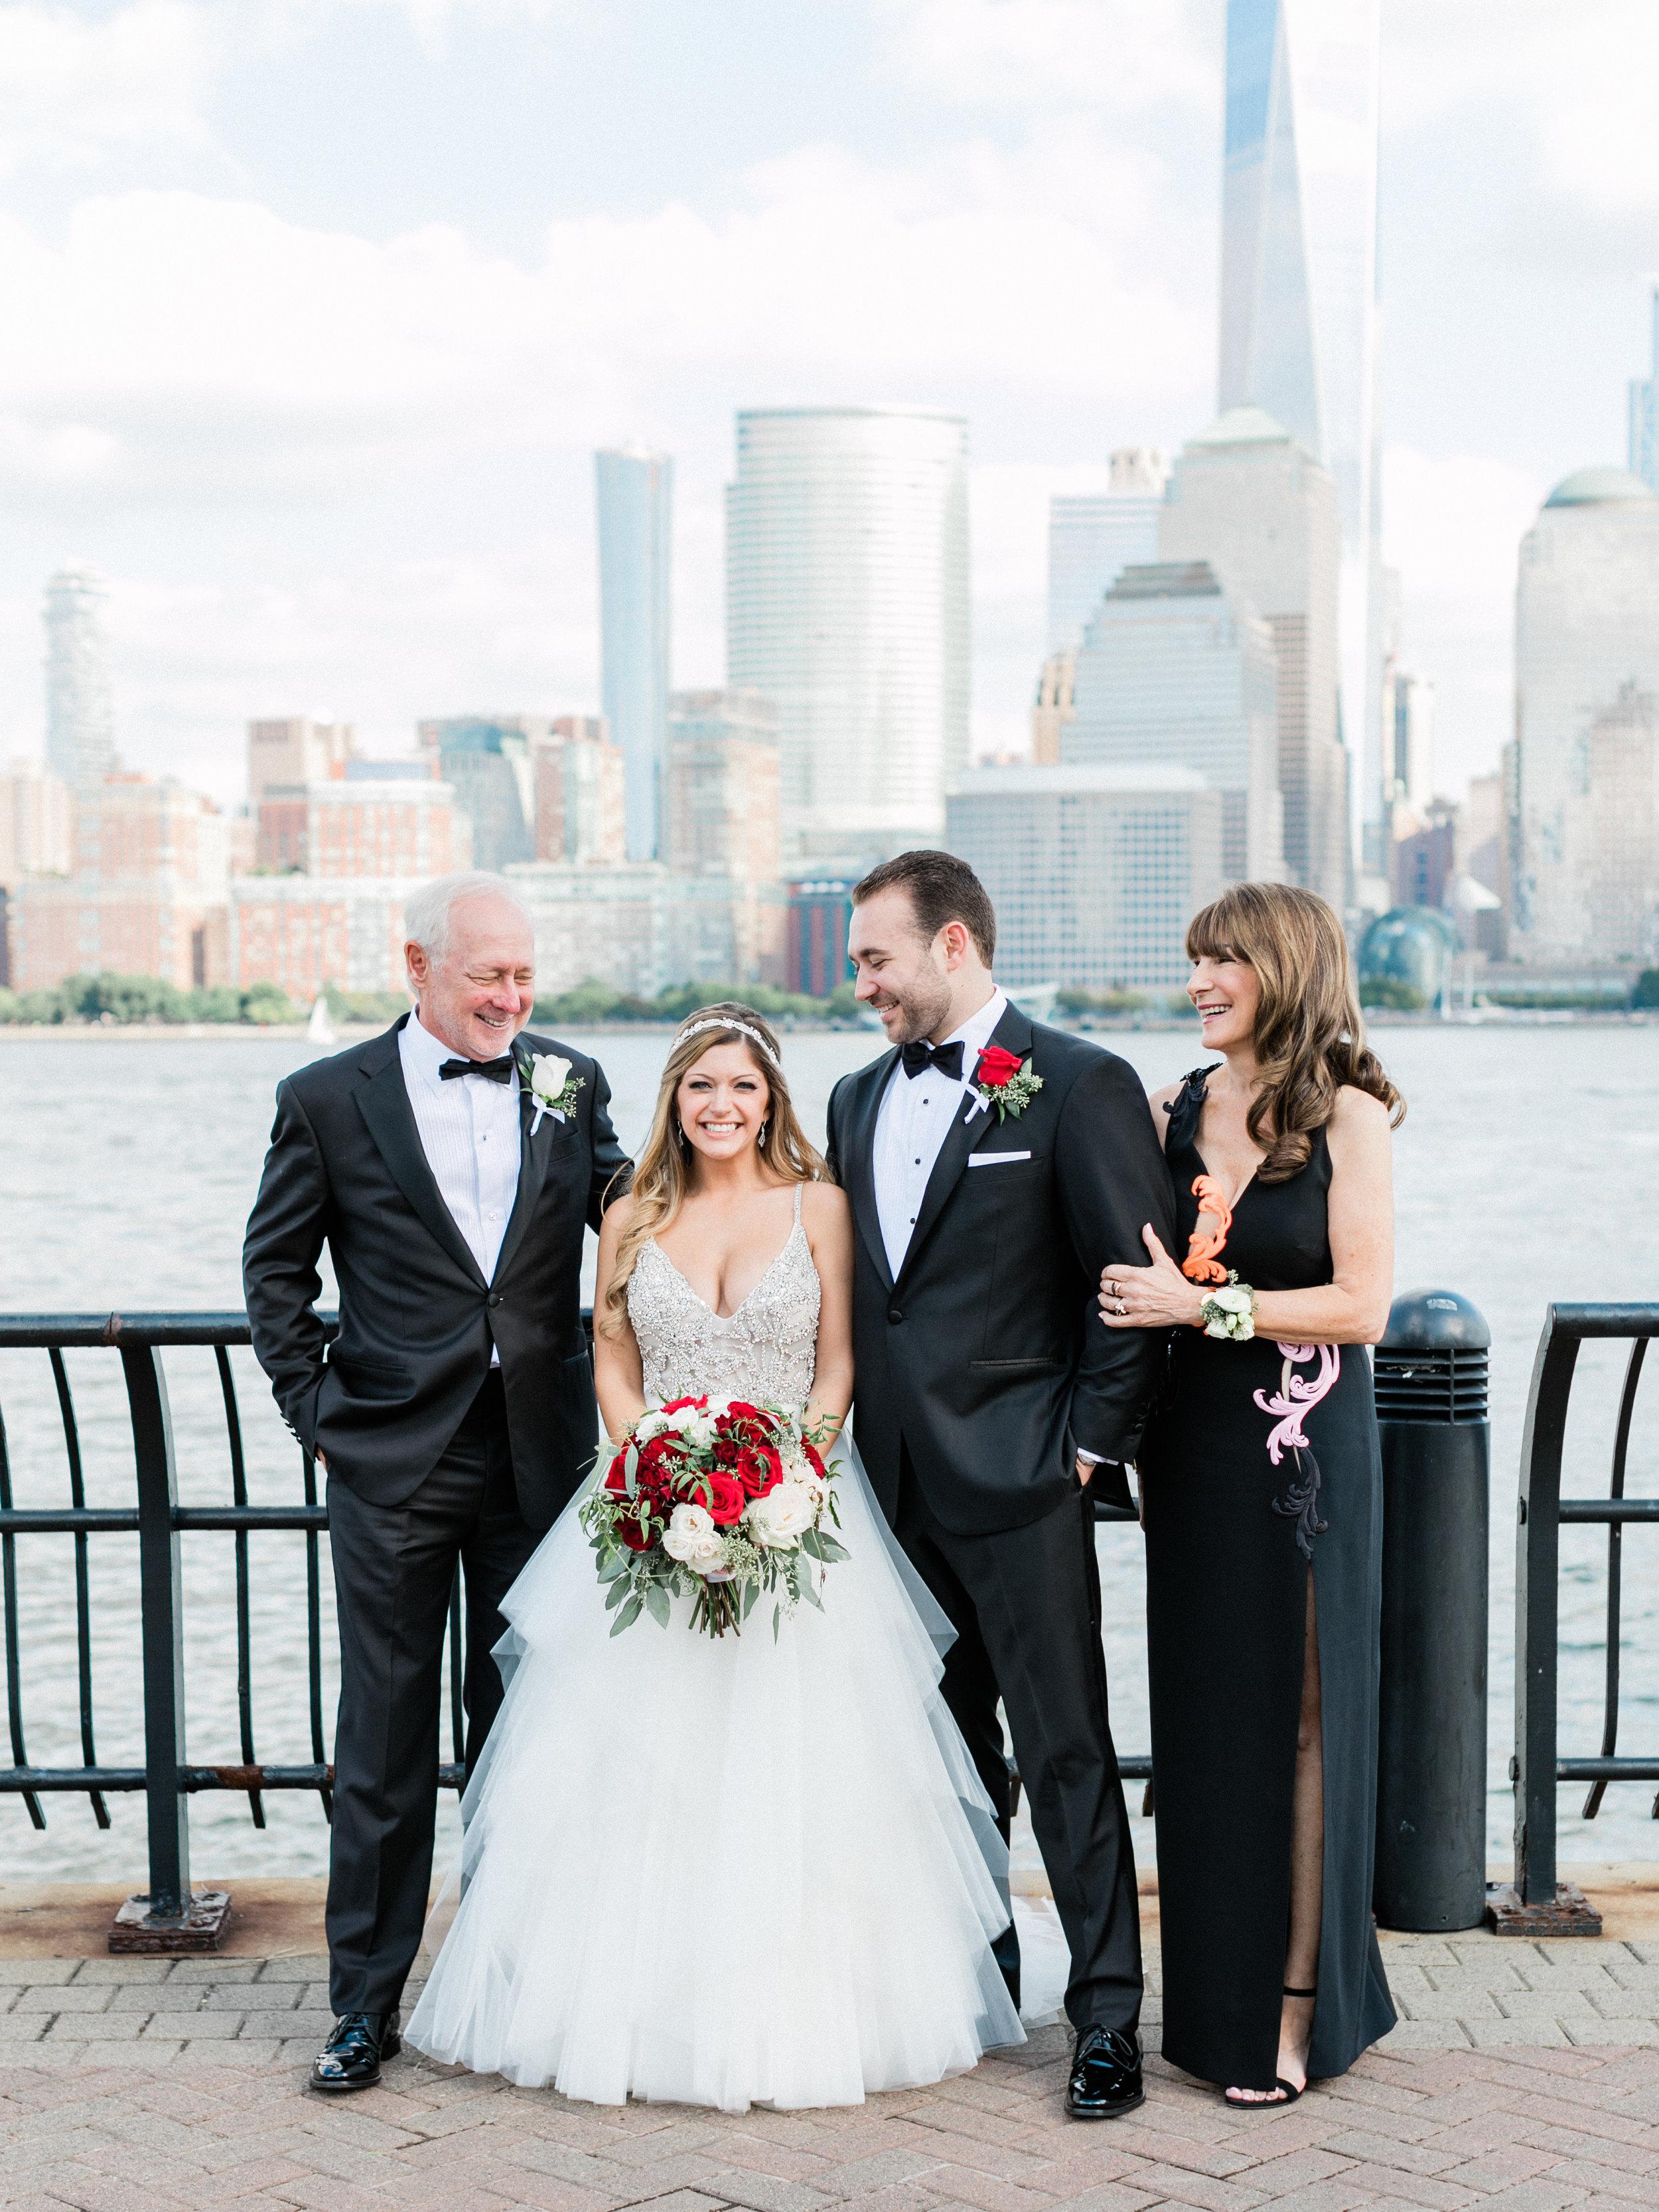 hyatt-regency-jersey-city-wedding-photographer31.jpg